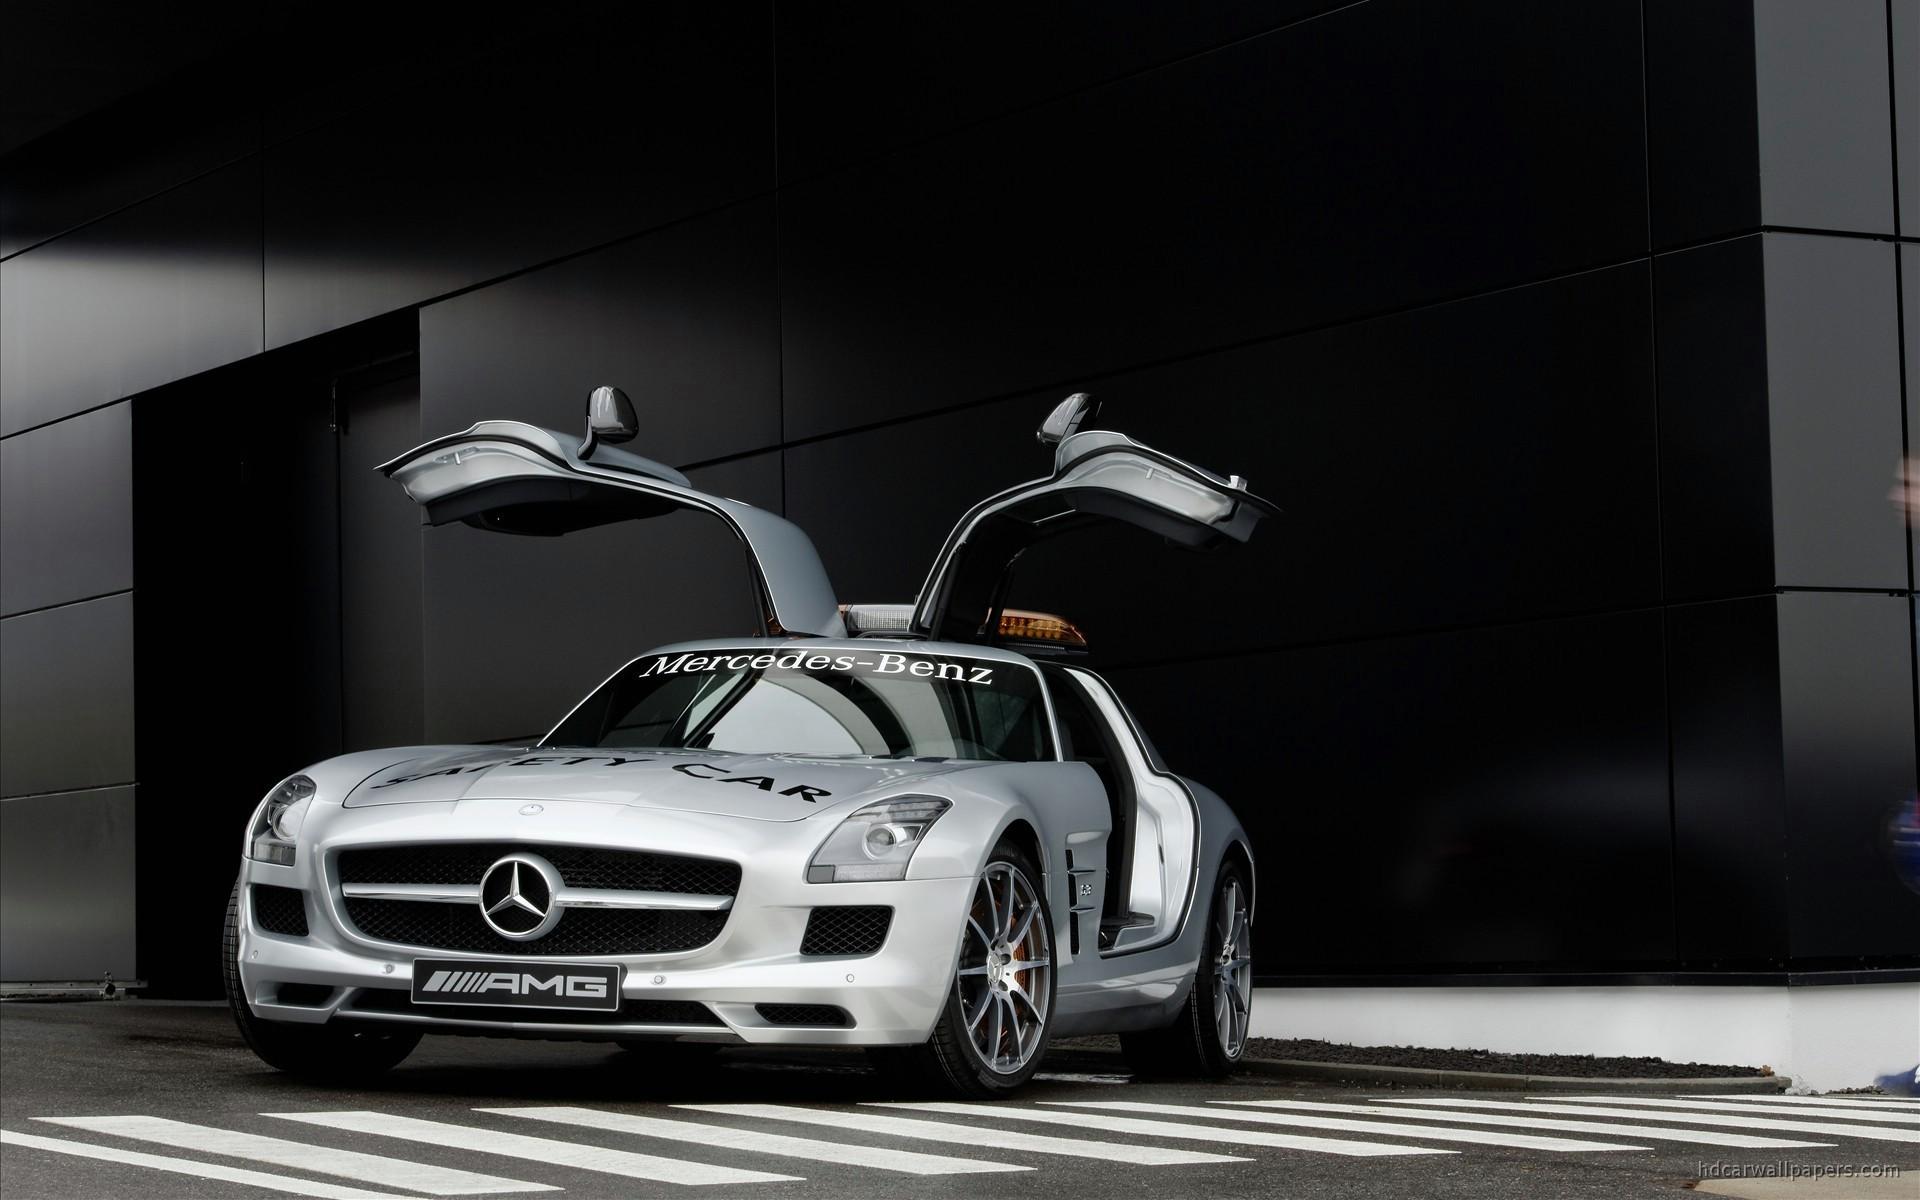 White Jaguar Car Wallpaper Hd 2010 Mercedes Benz Sls Amg F1 Safety Car Wallpaper Hd